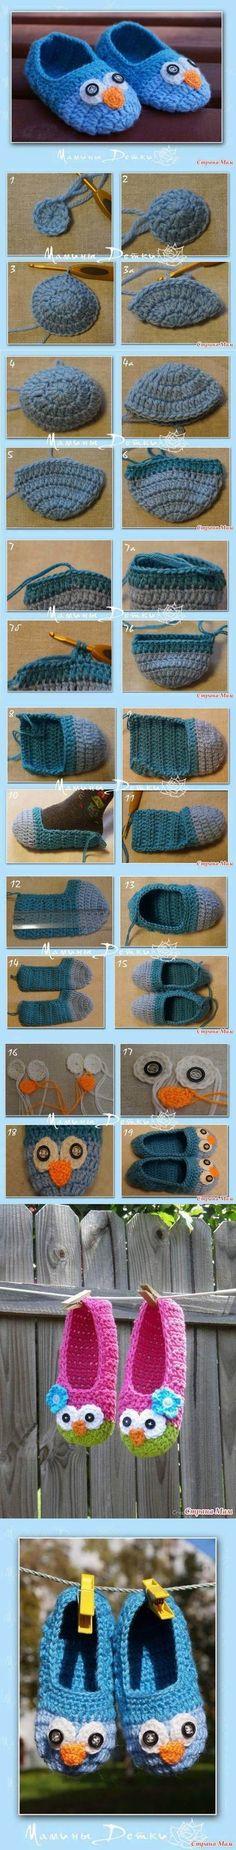 Crochet owls diy